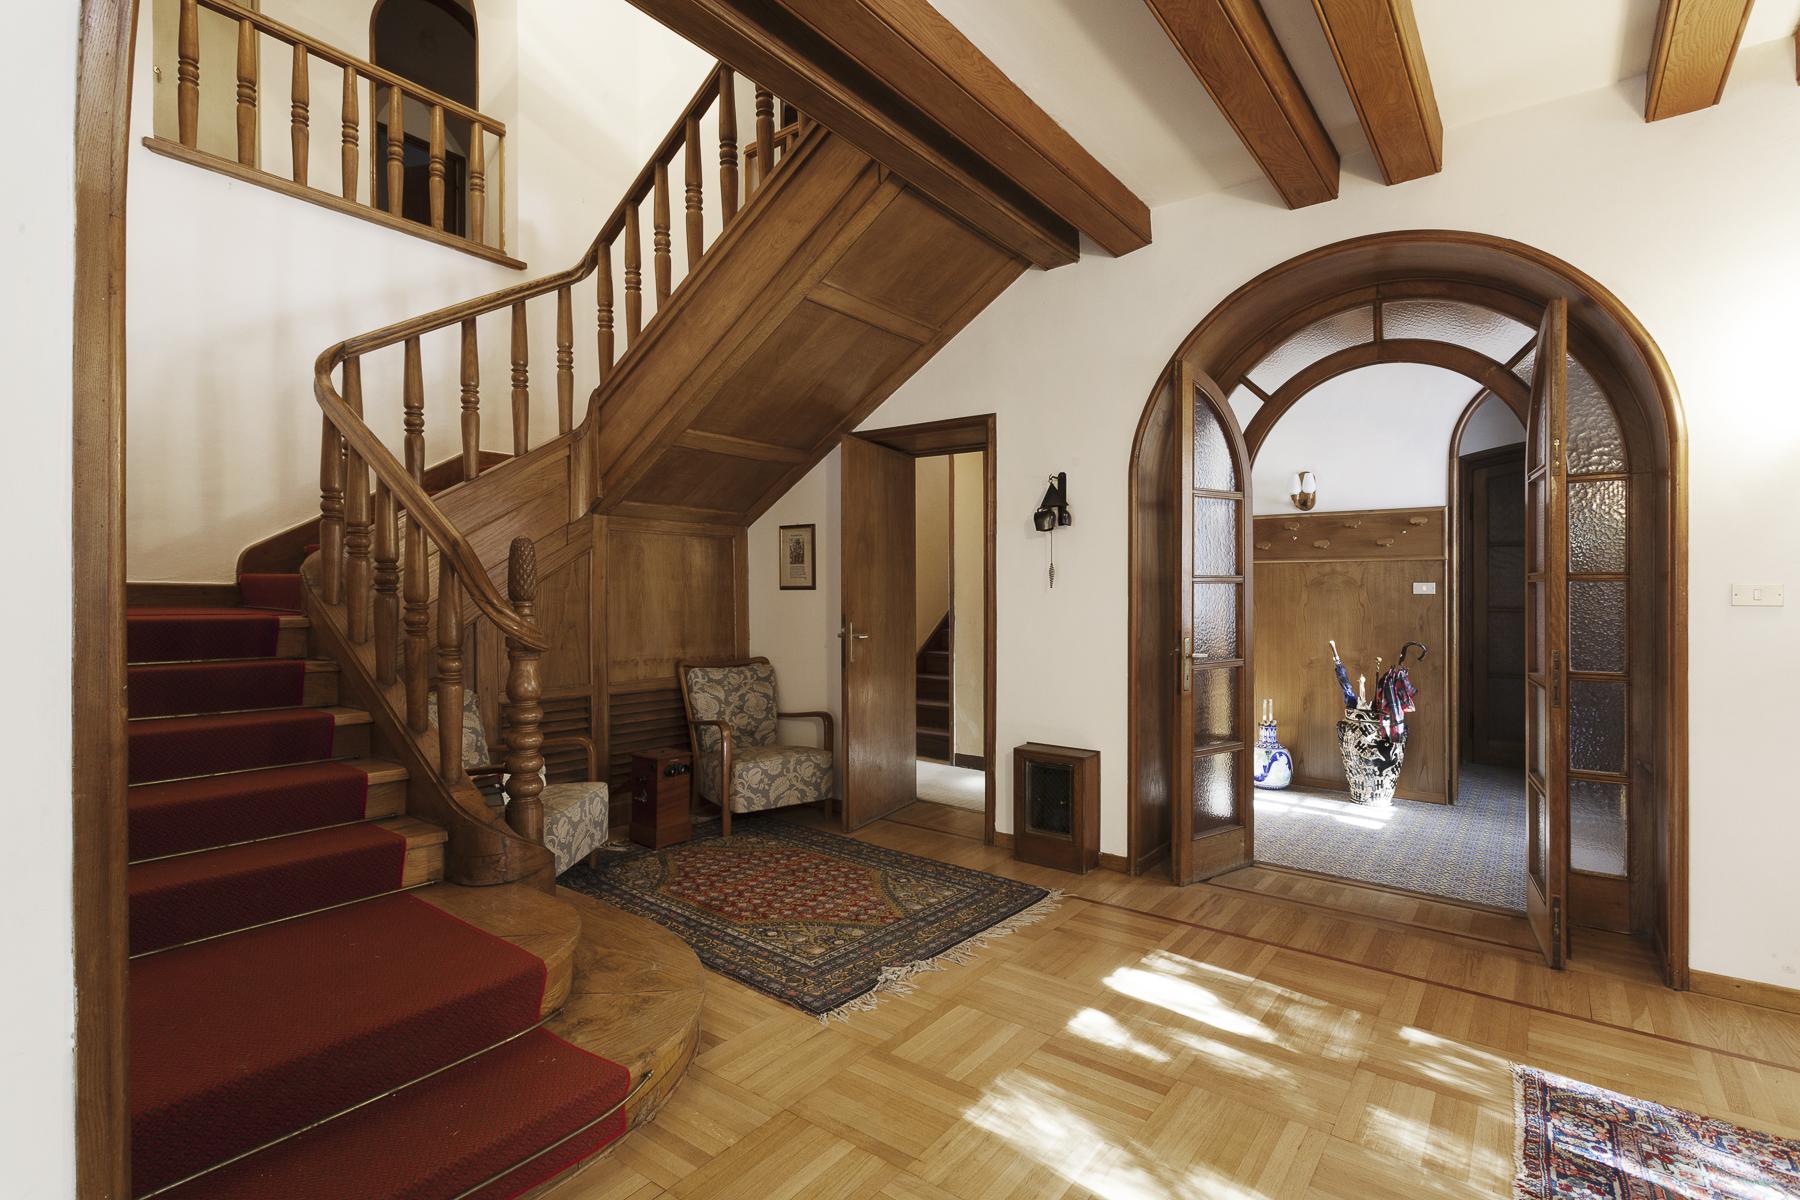 Villa in Vendita a Courmayeur: 5 locali, 2200 mq - Foto 2